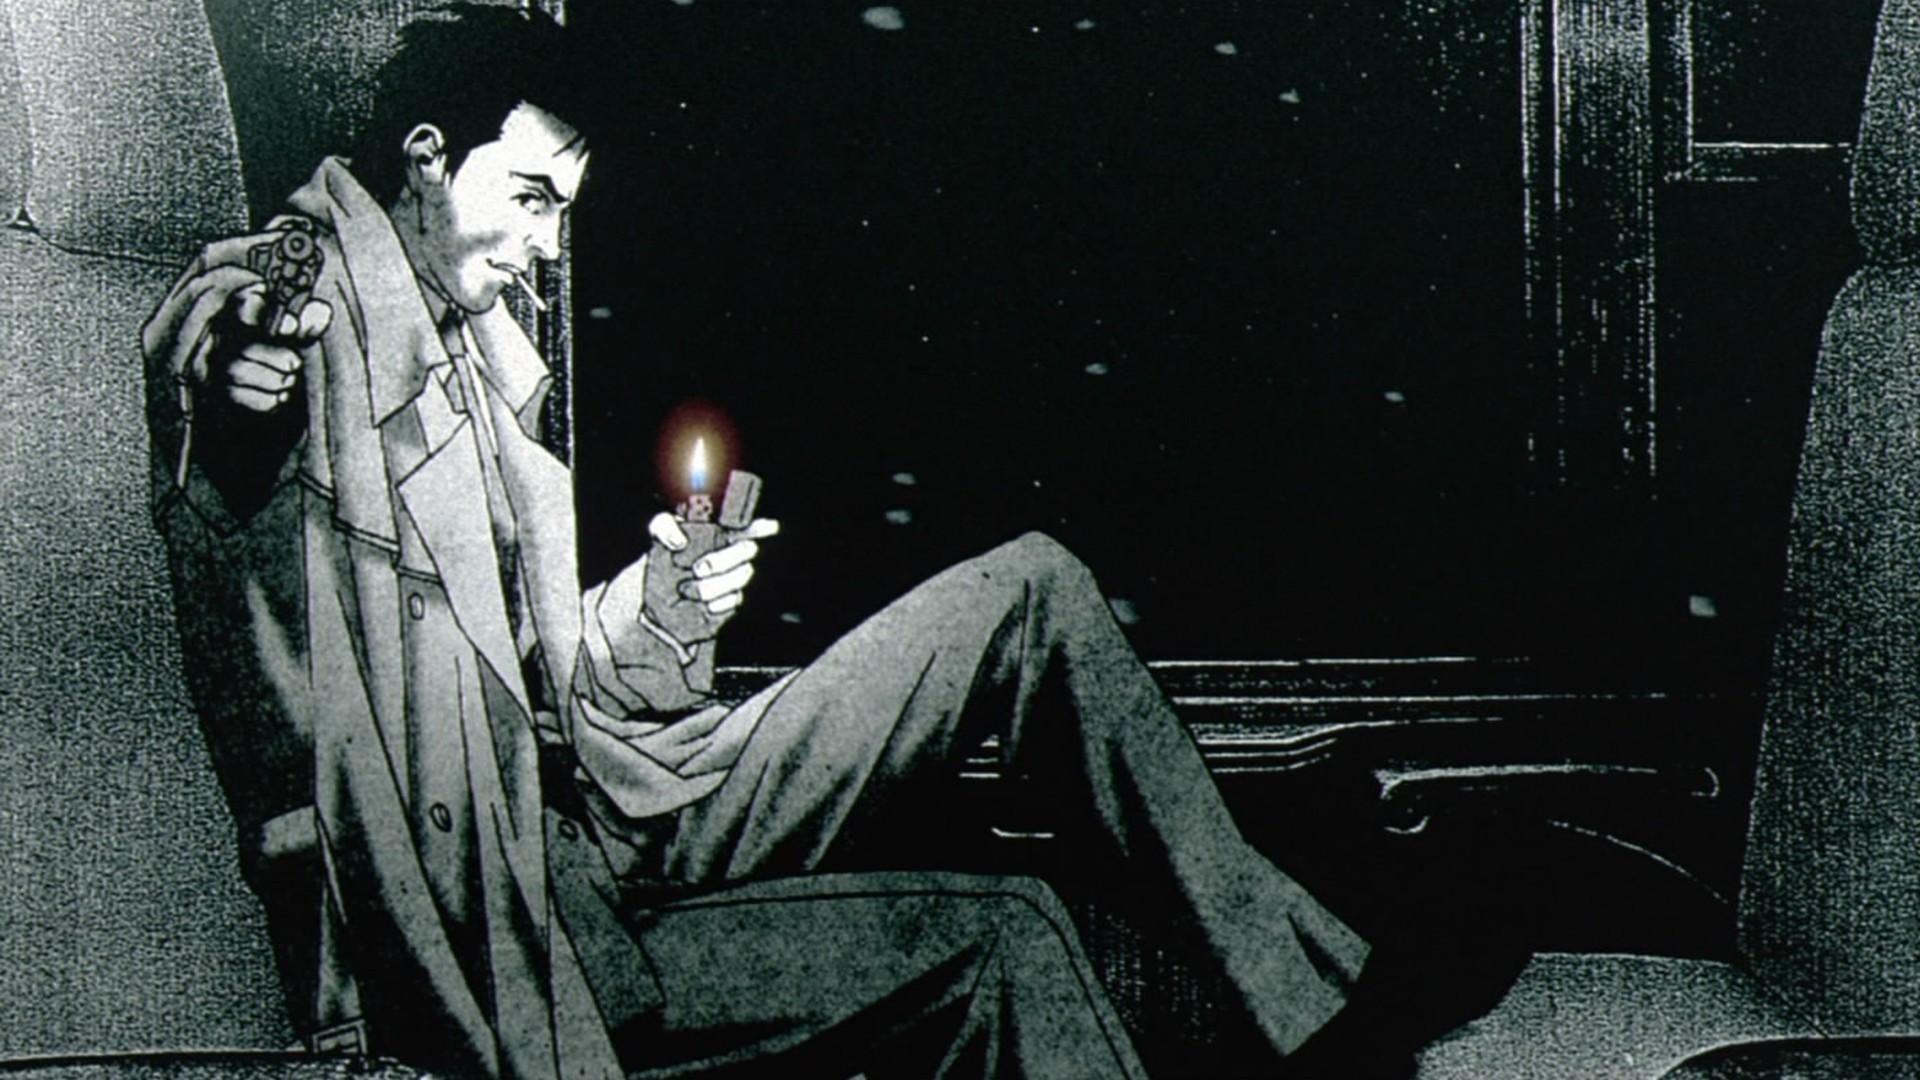 Anime The Animatrix Wallpaper - Resolution:1920x1080 - ID:120868 -  wallha.com